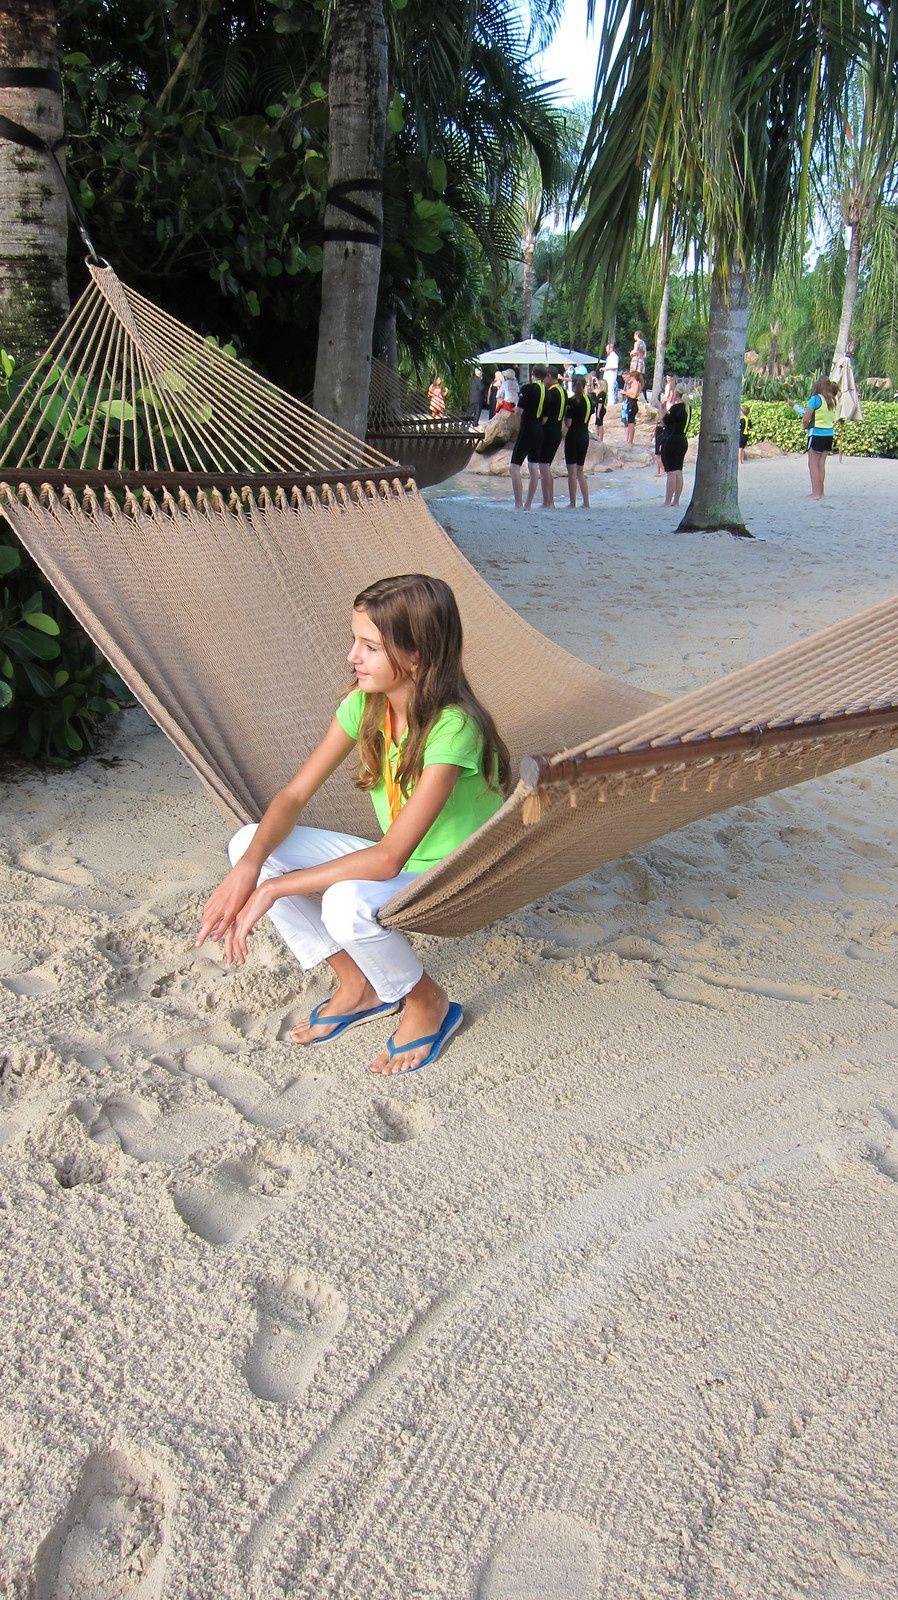 Recit d'une journee extraordinaire a Discovery Cove Orlando - FL (1)